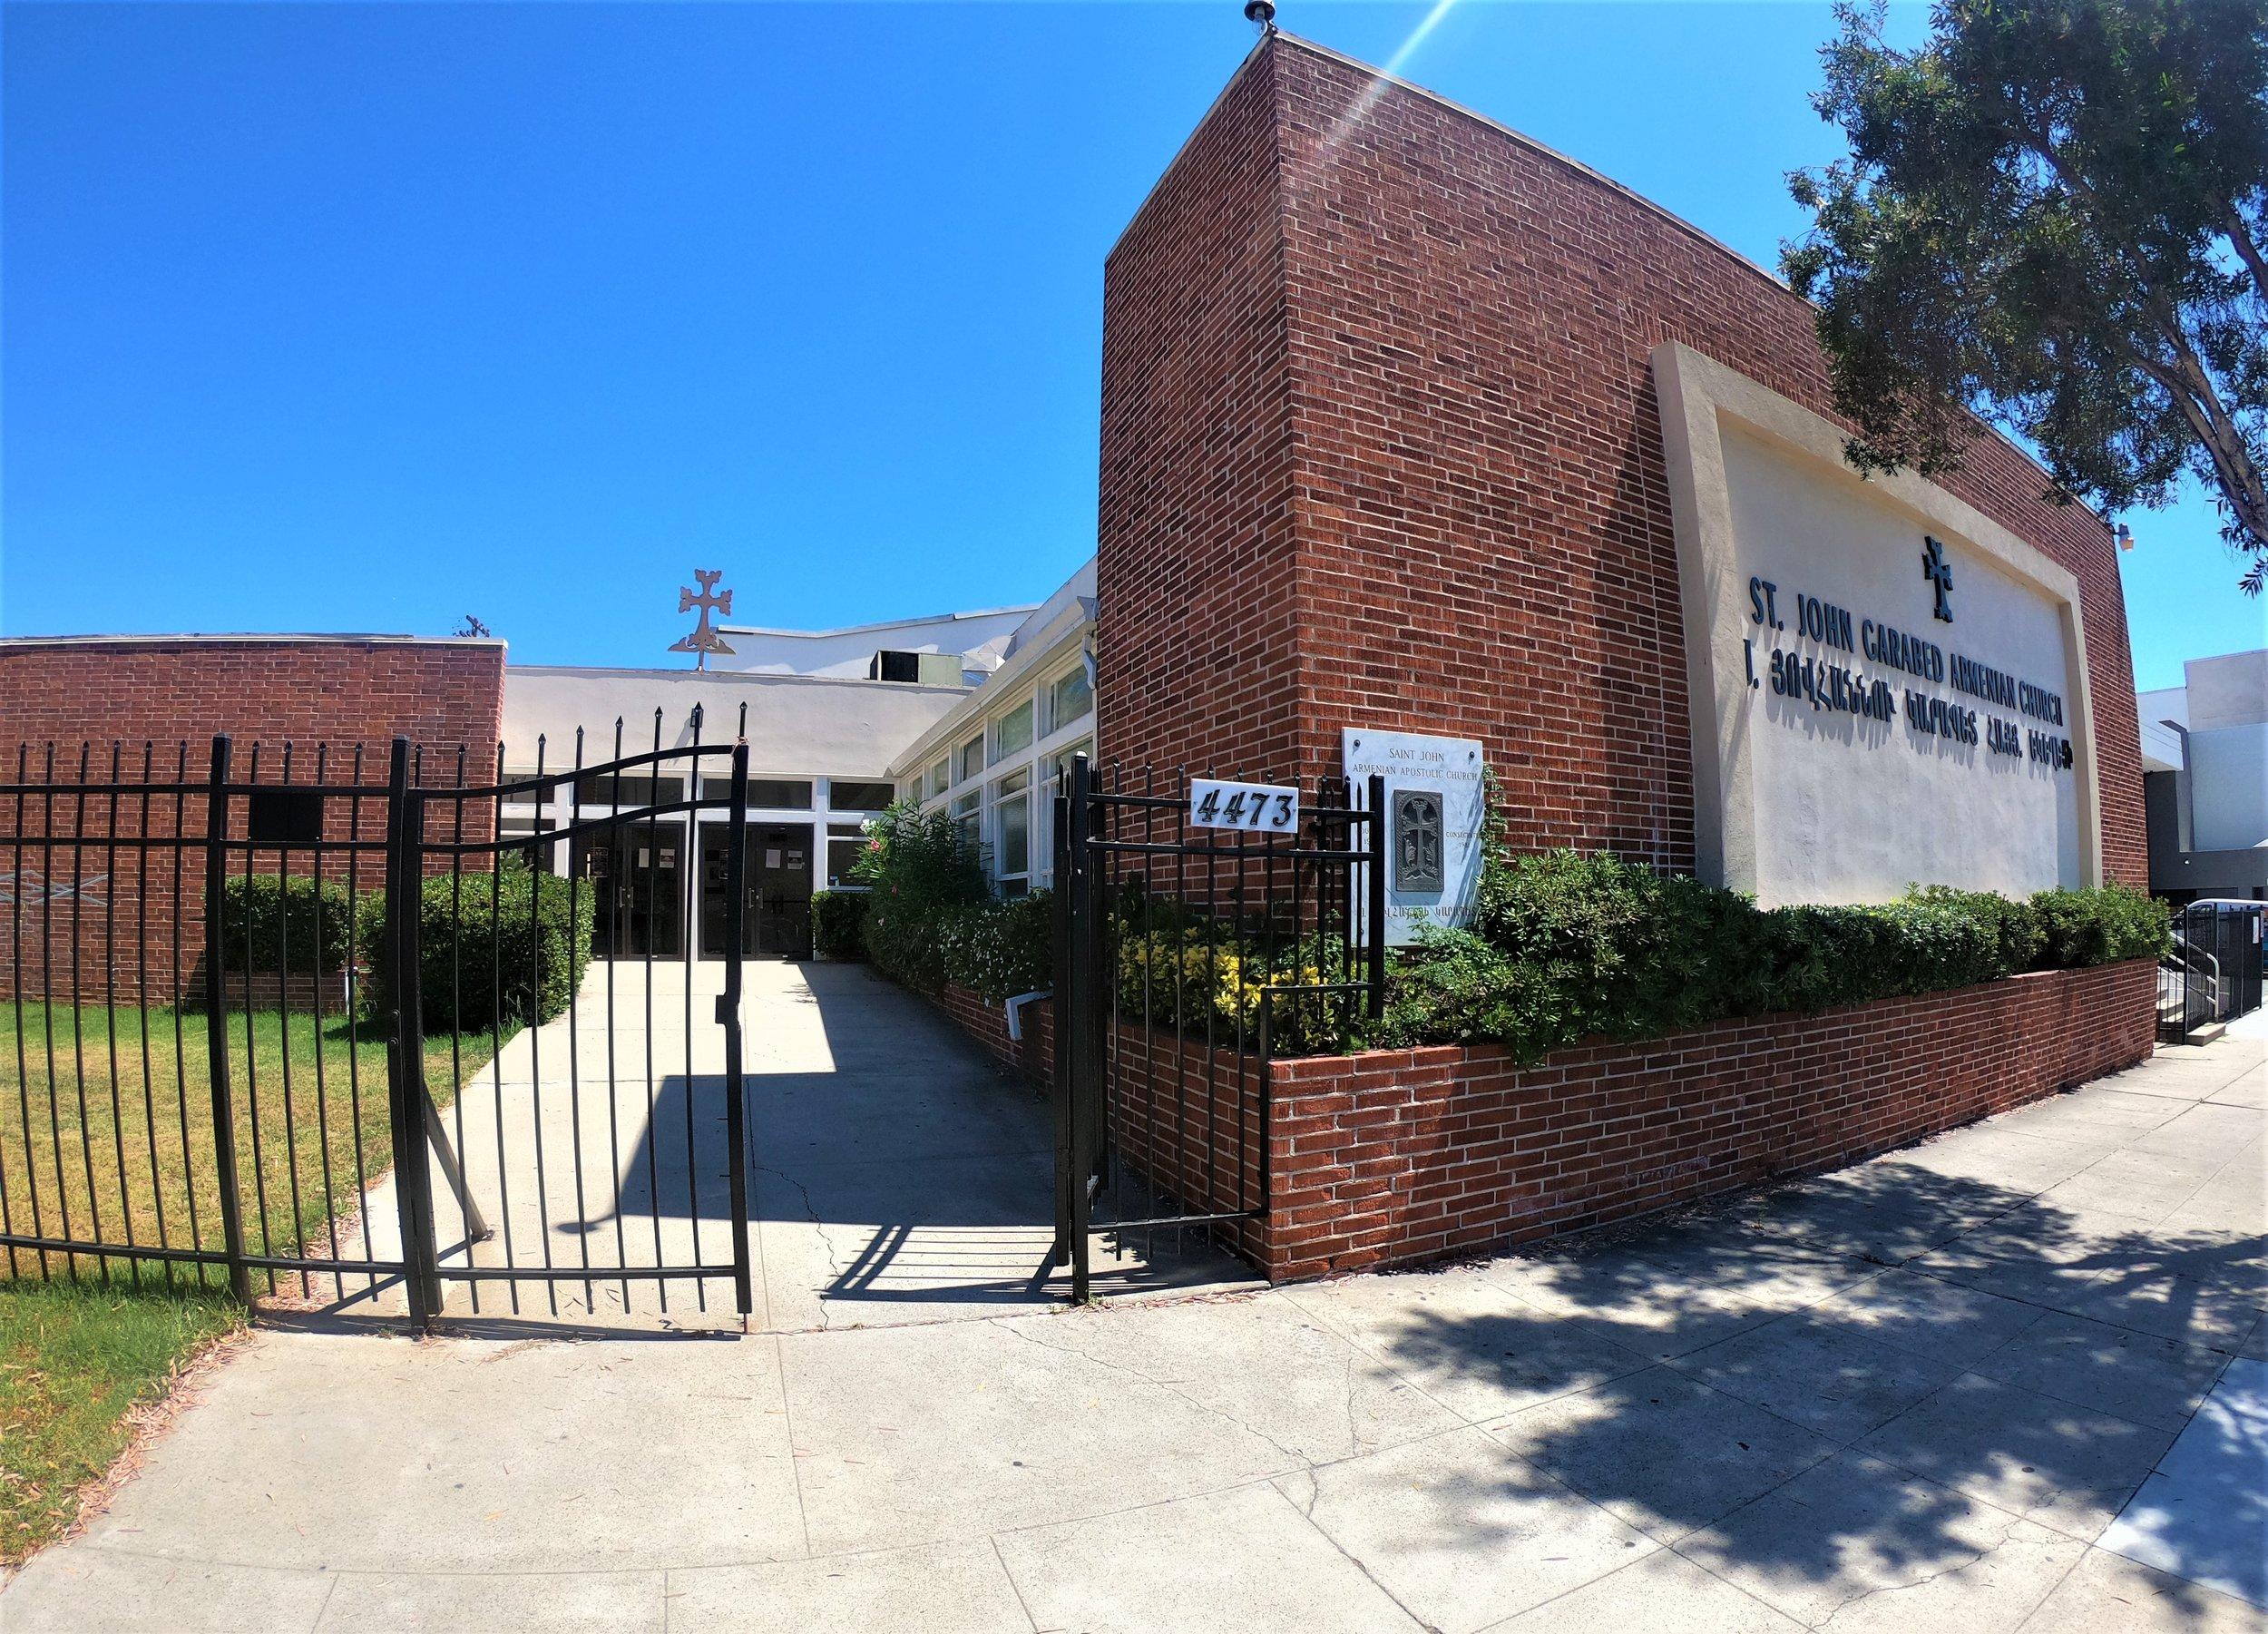 St. John Garabed Armenian Church in San Diego, California